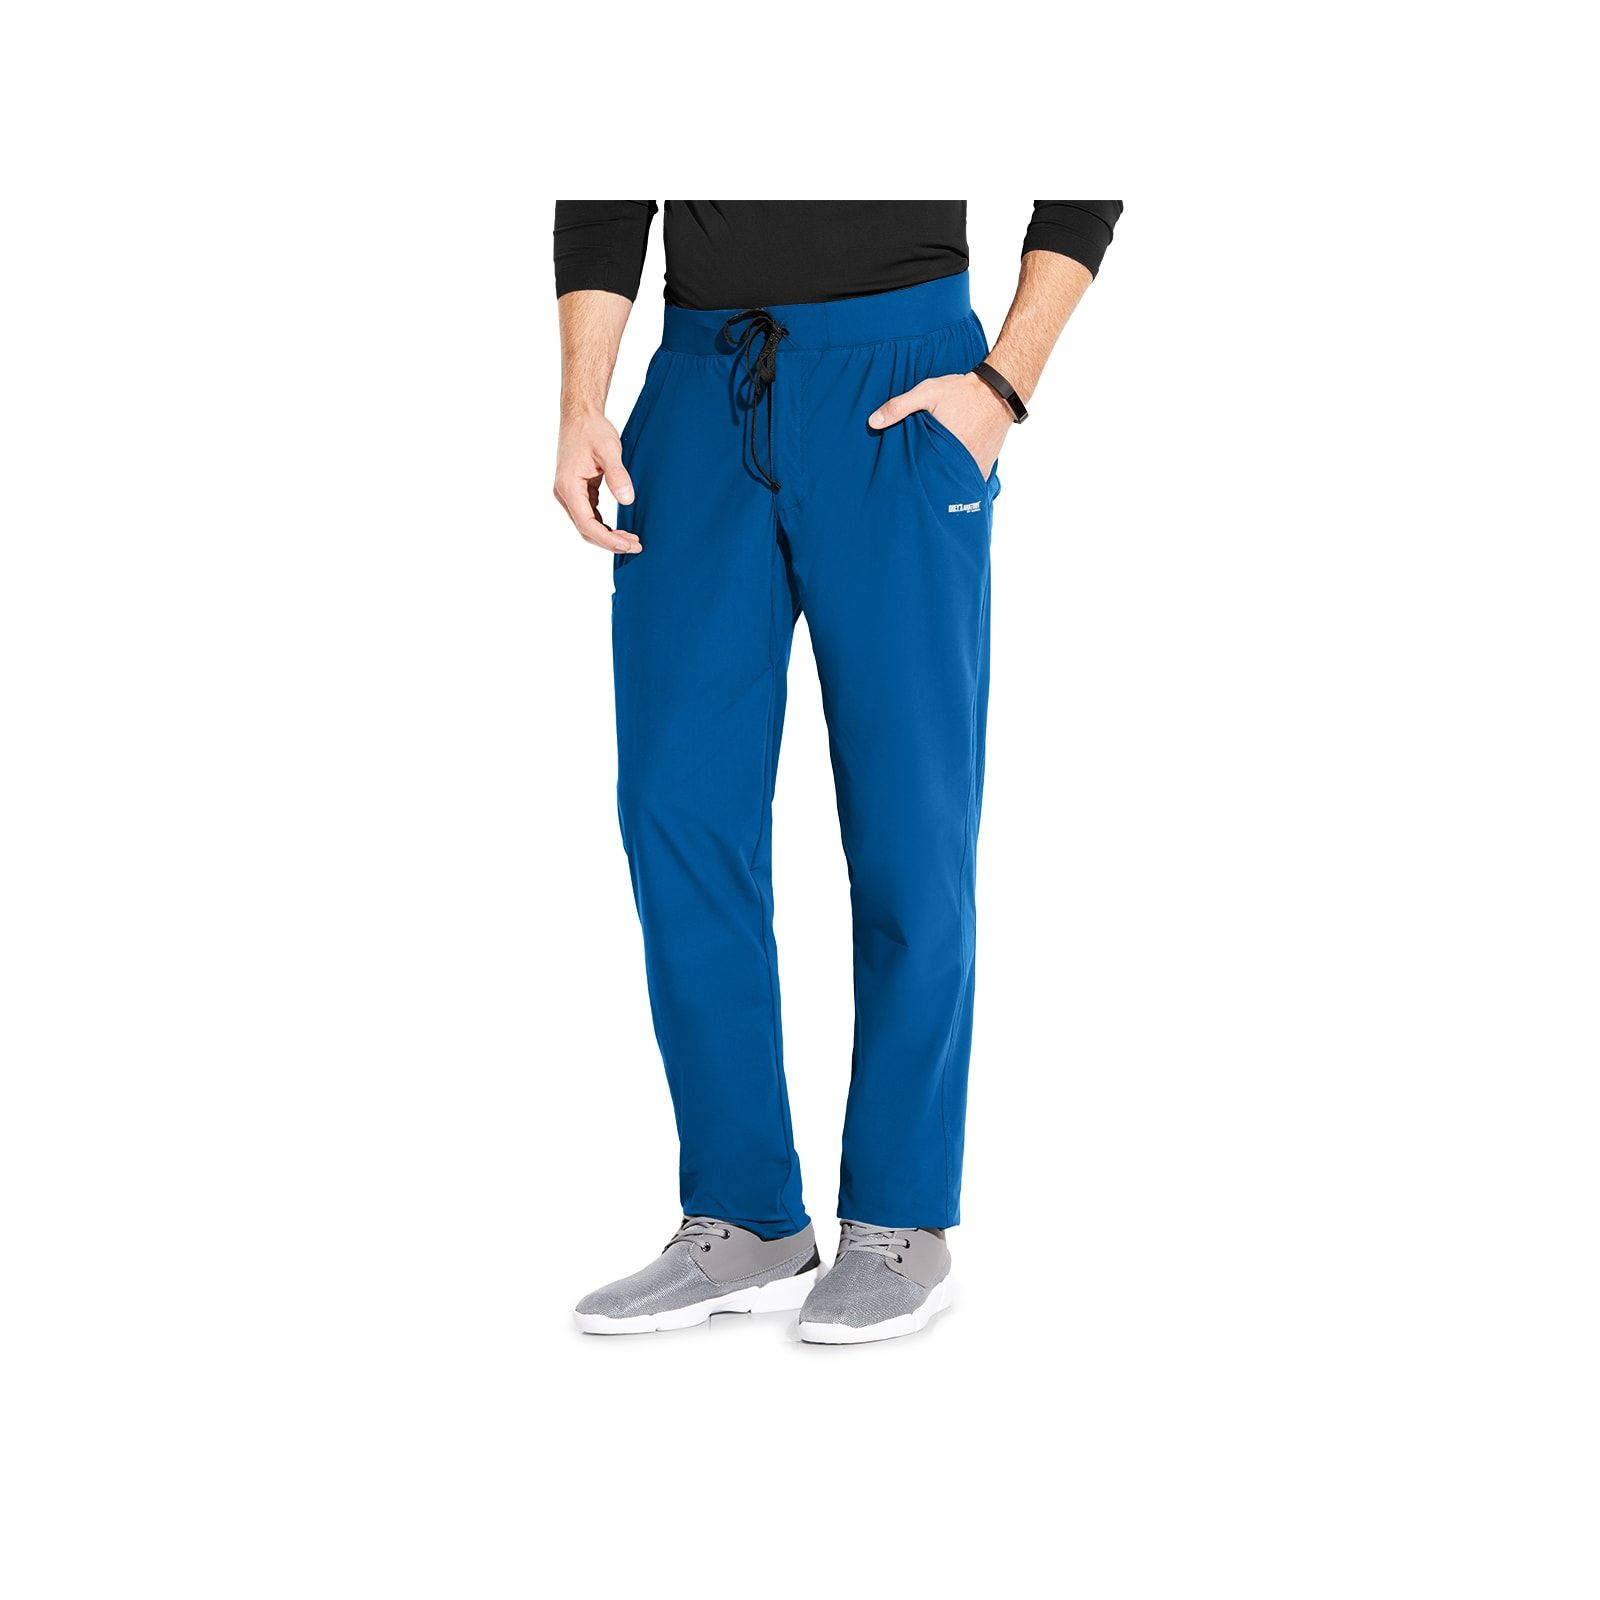 "Pantalon médical homme, couleur bleu royal vue de face, collection ""Grey's Anatomy Edge"" (GEP002-)"